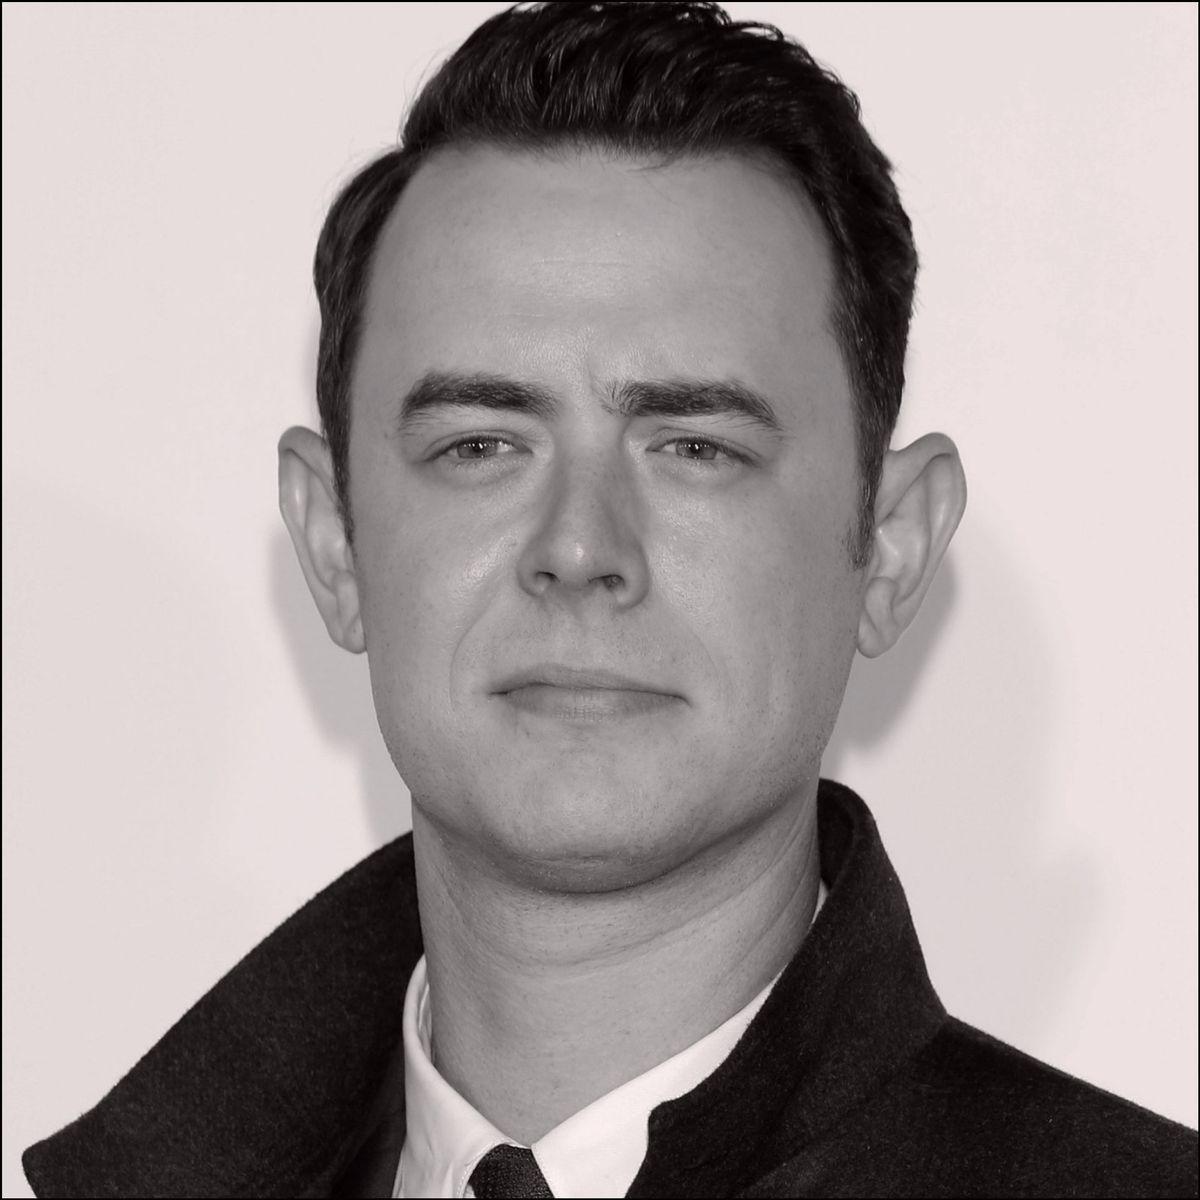 Colin Hanks